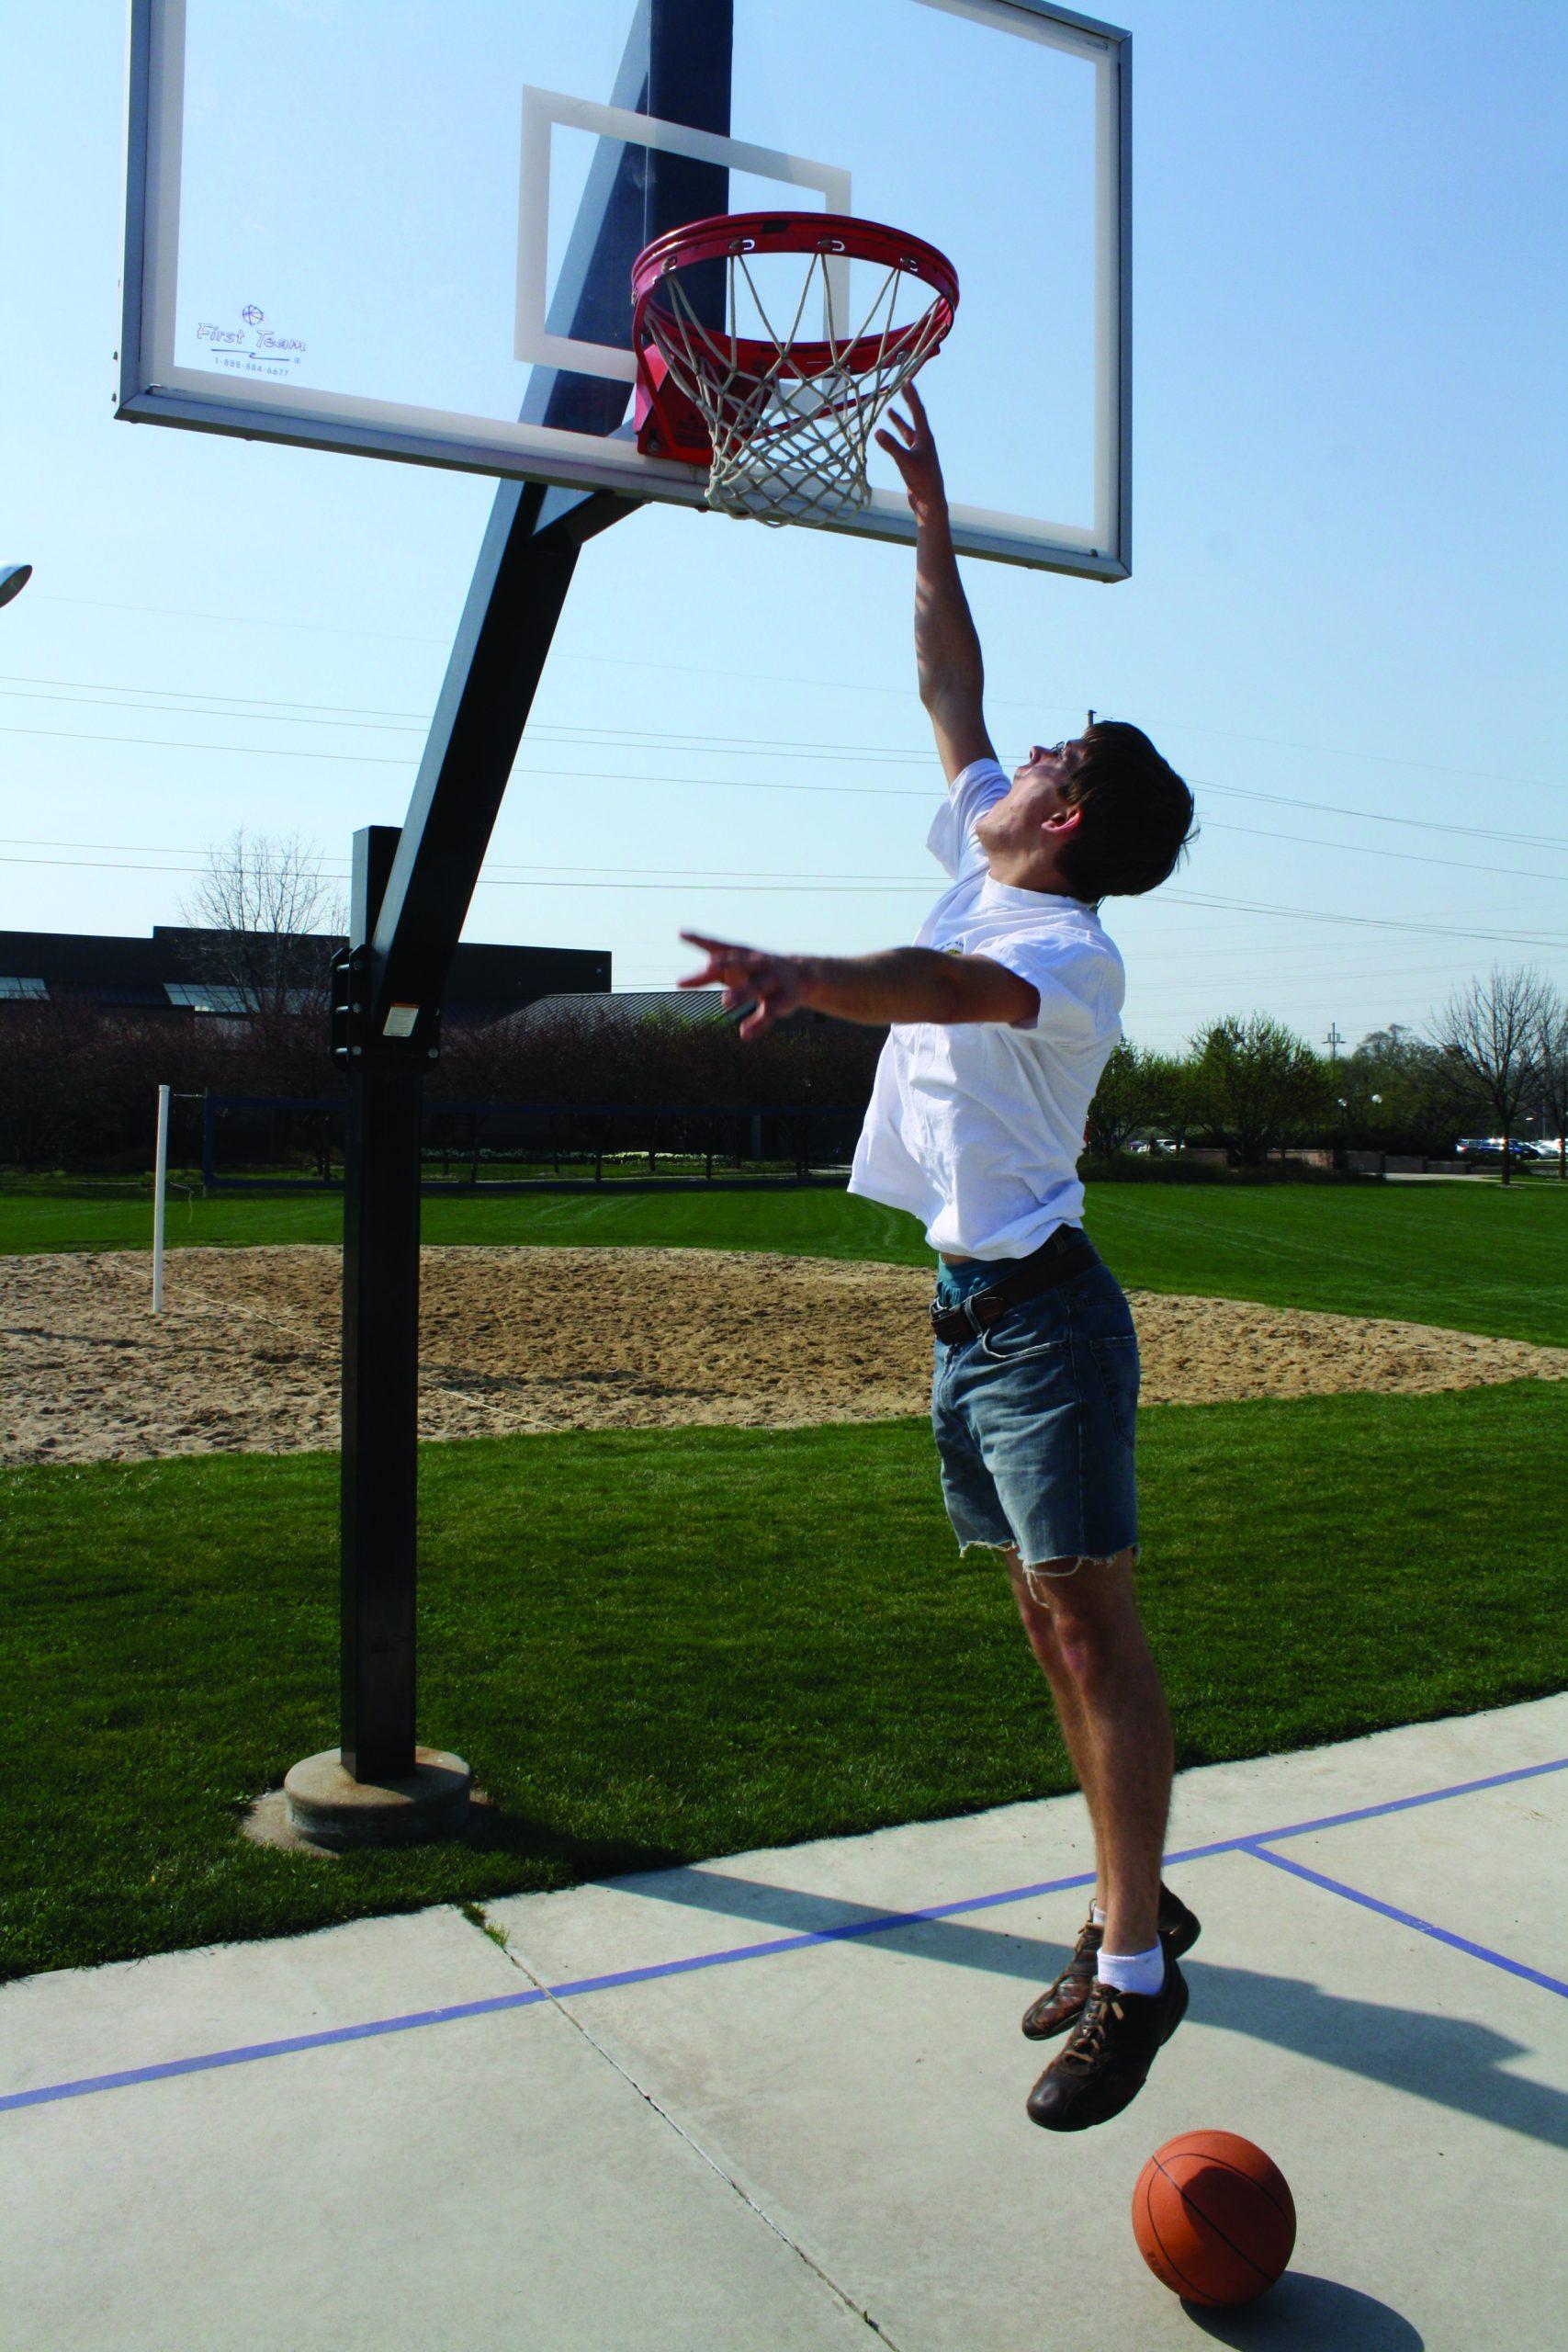 Nate Day dunks a basketball